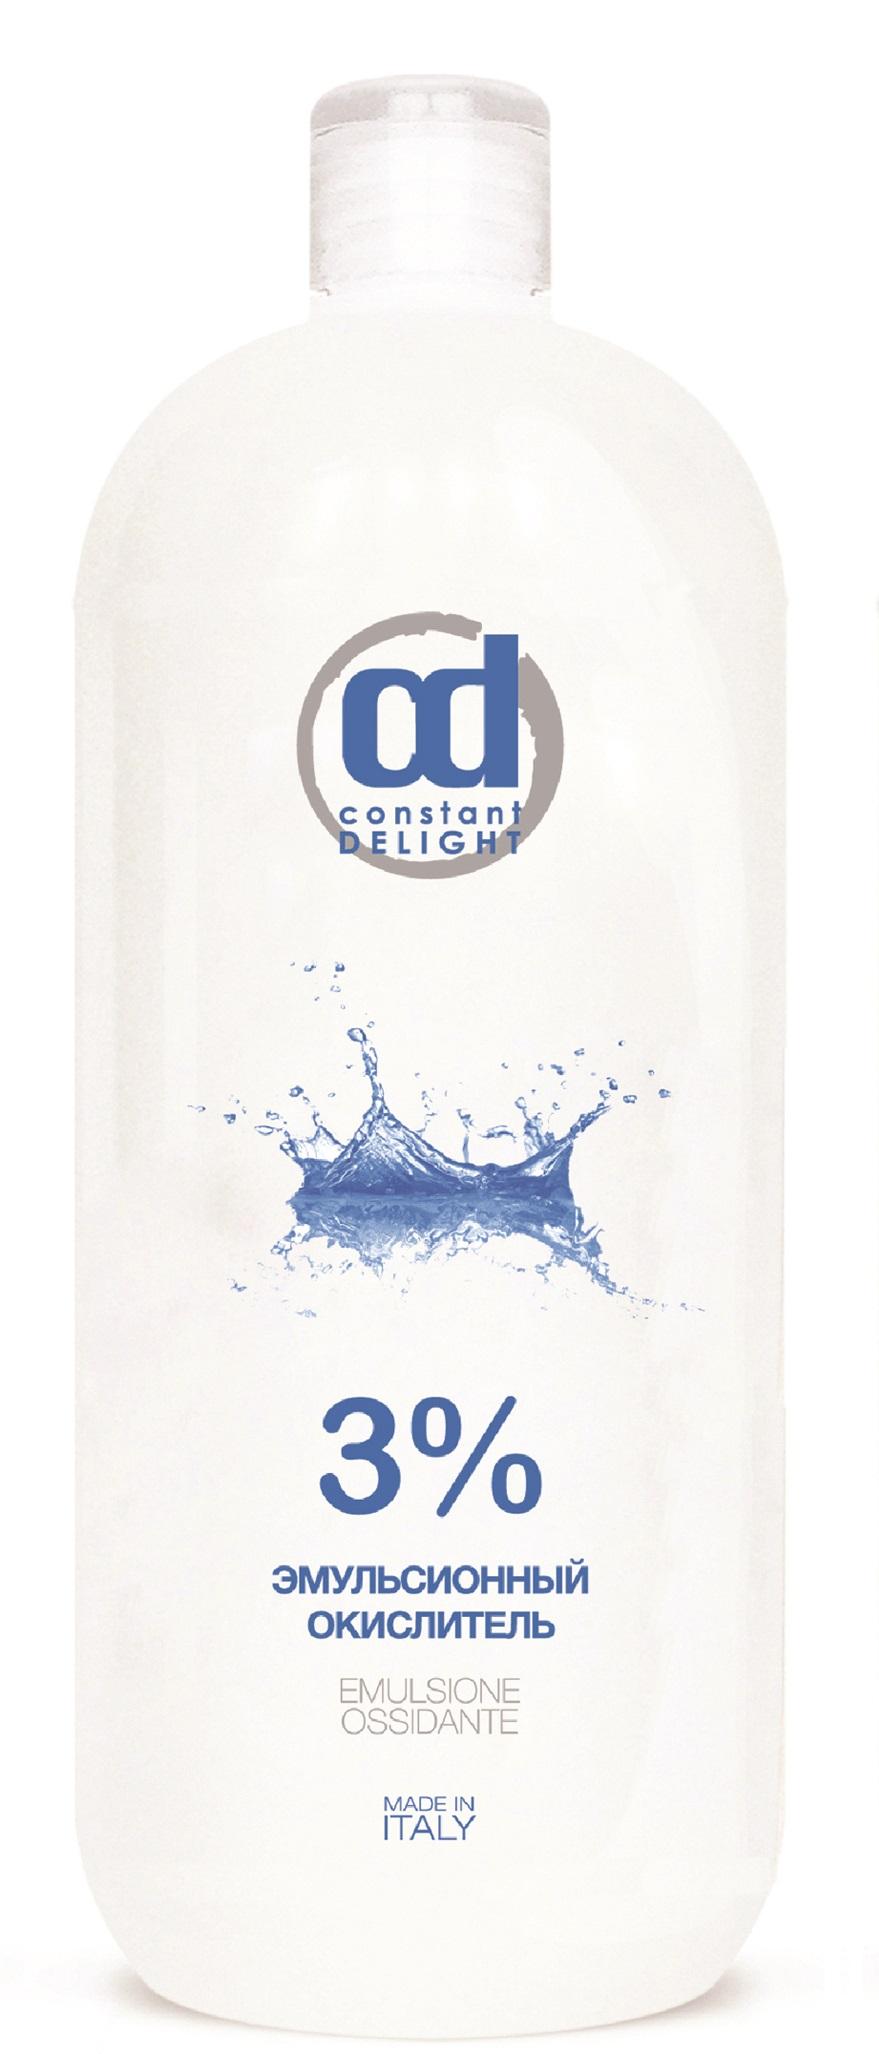 CONSTANT DELIGHT Окислитель эмульсионный 3% белый / Oxigent, 1000 мл